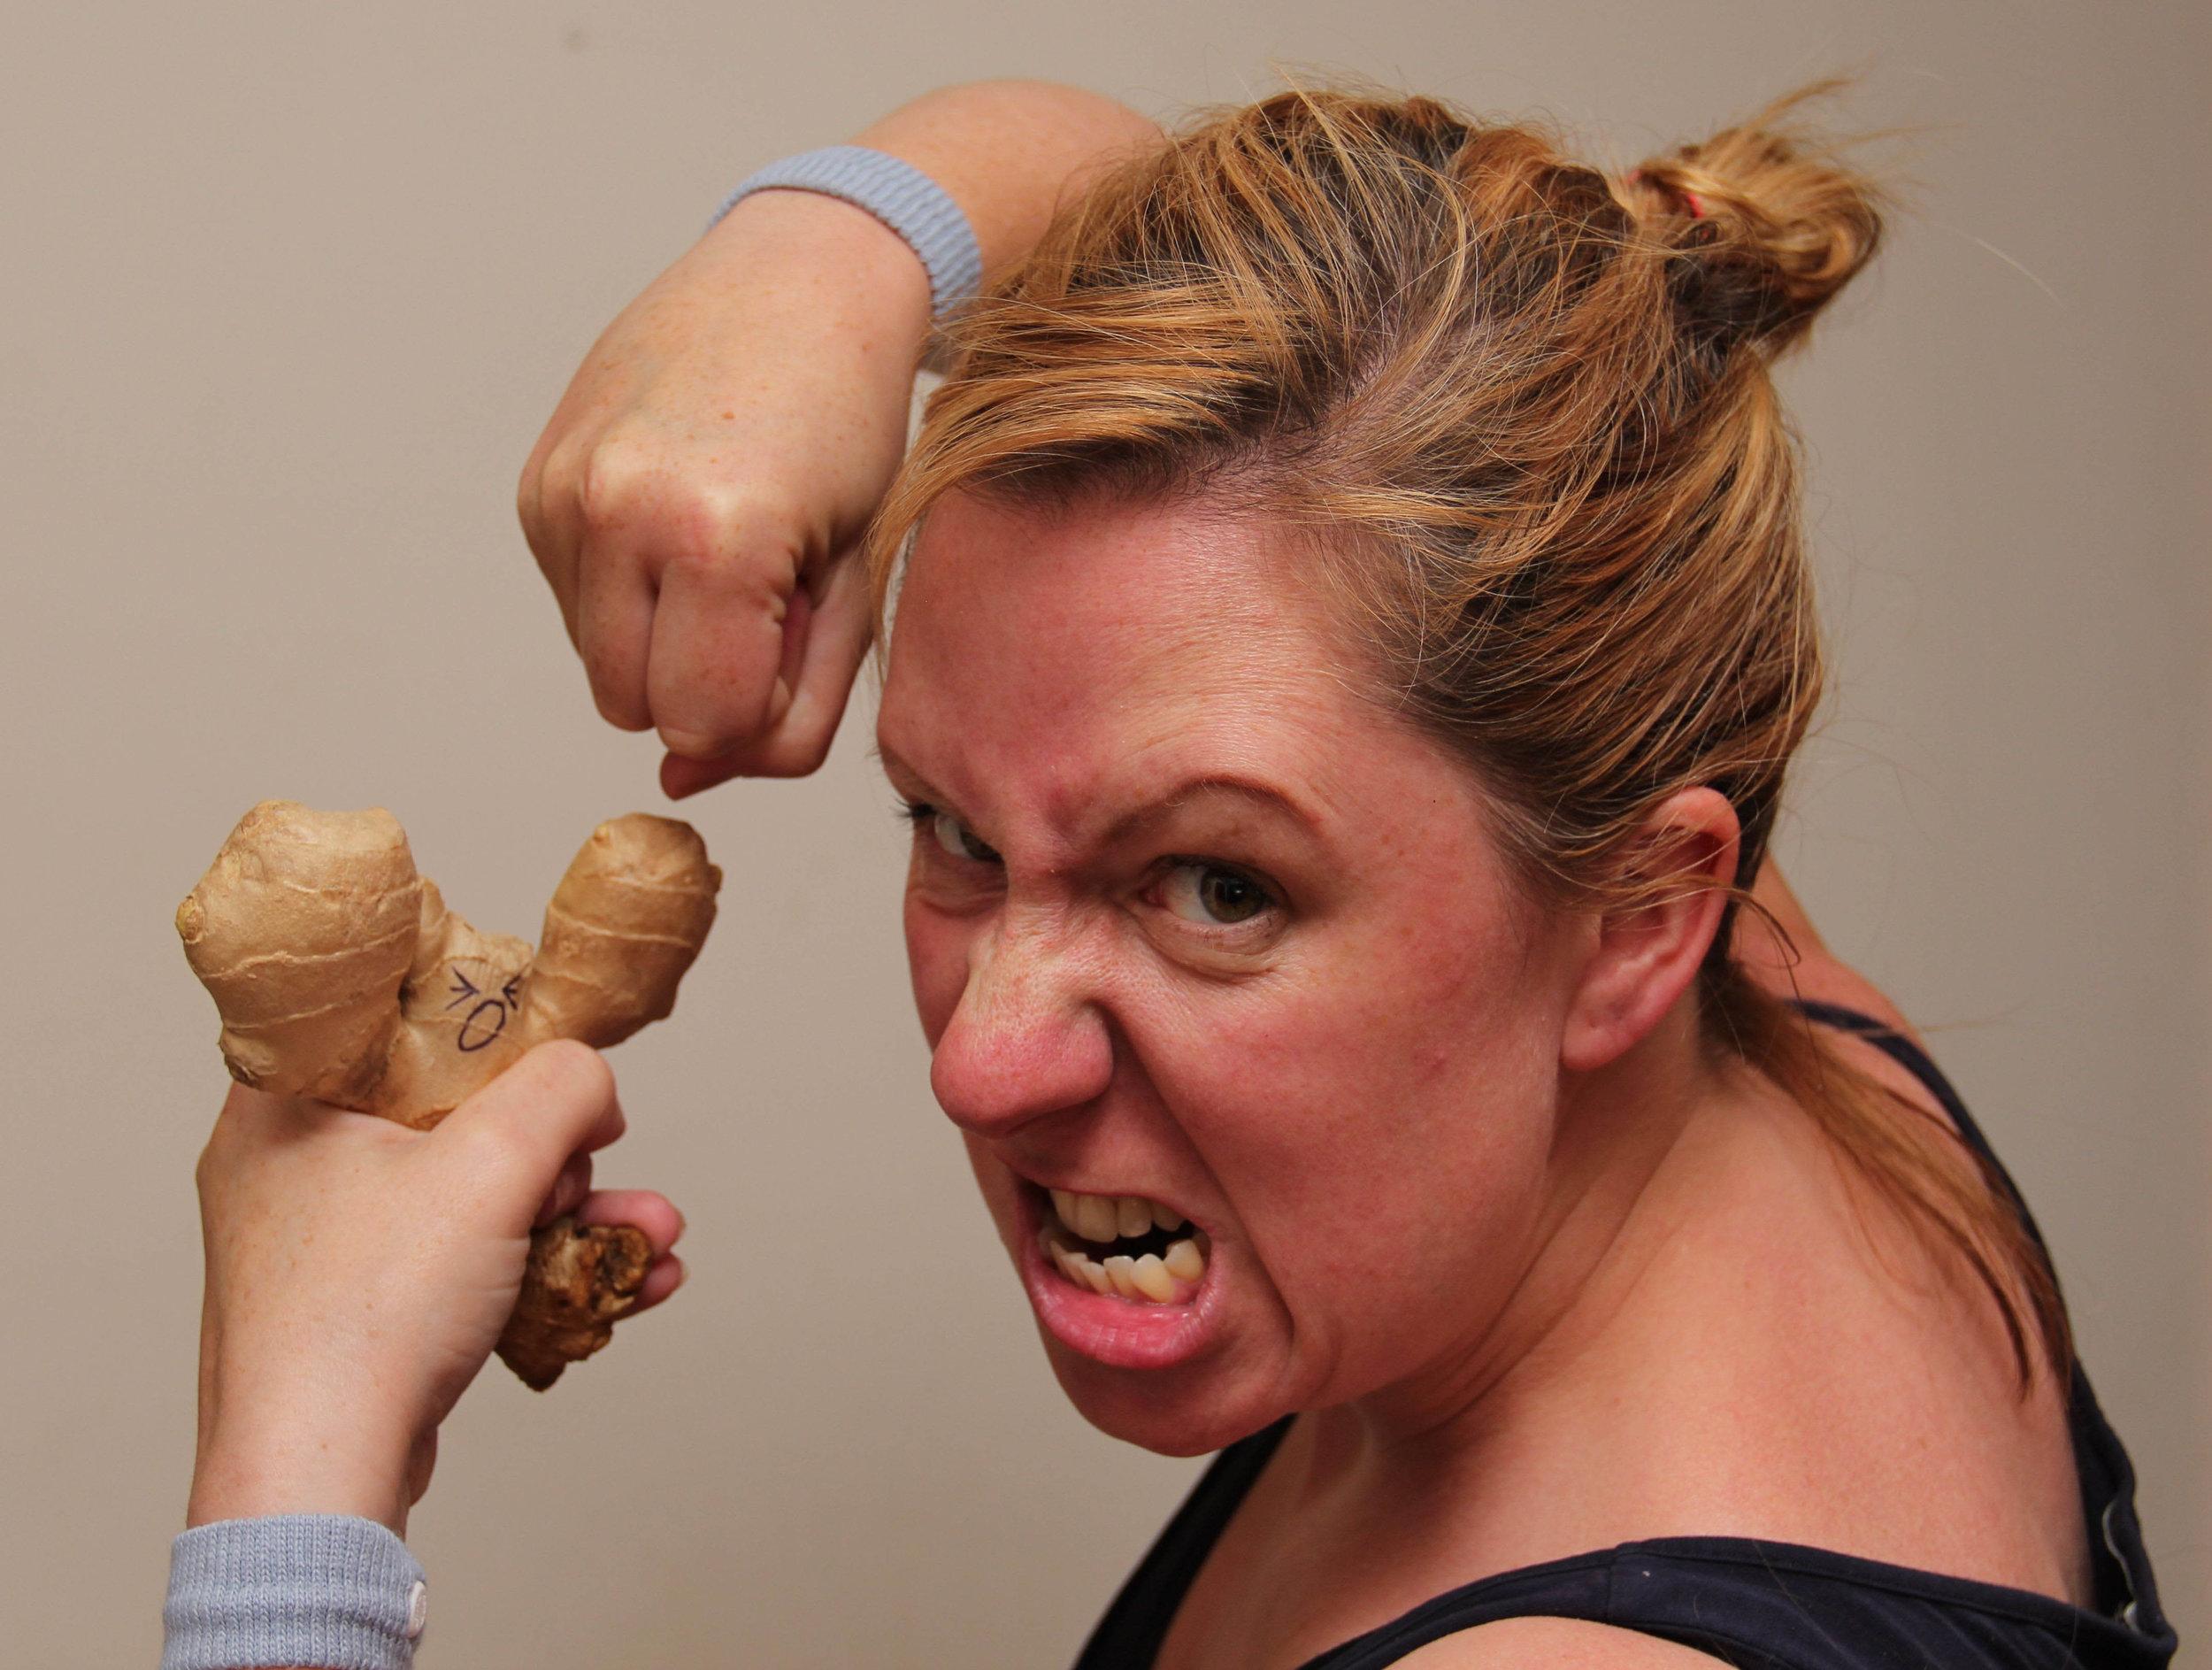 punching-ginger.jpg